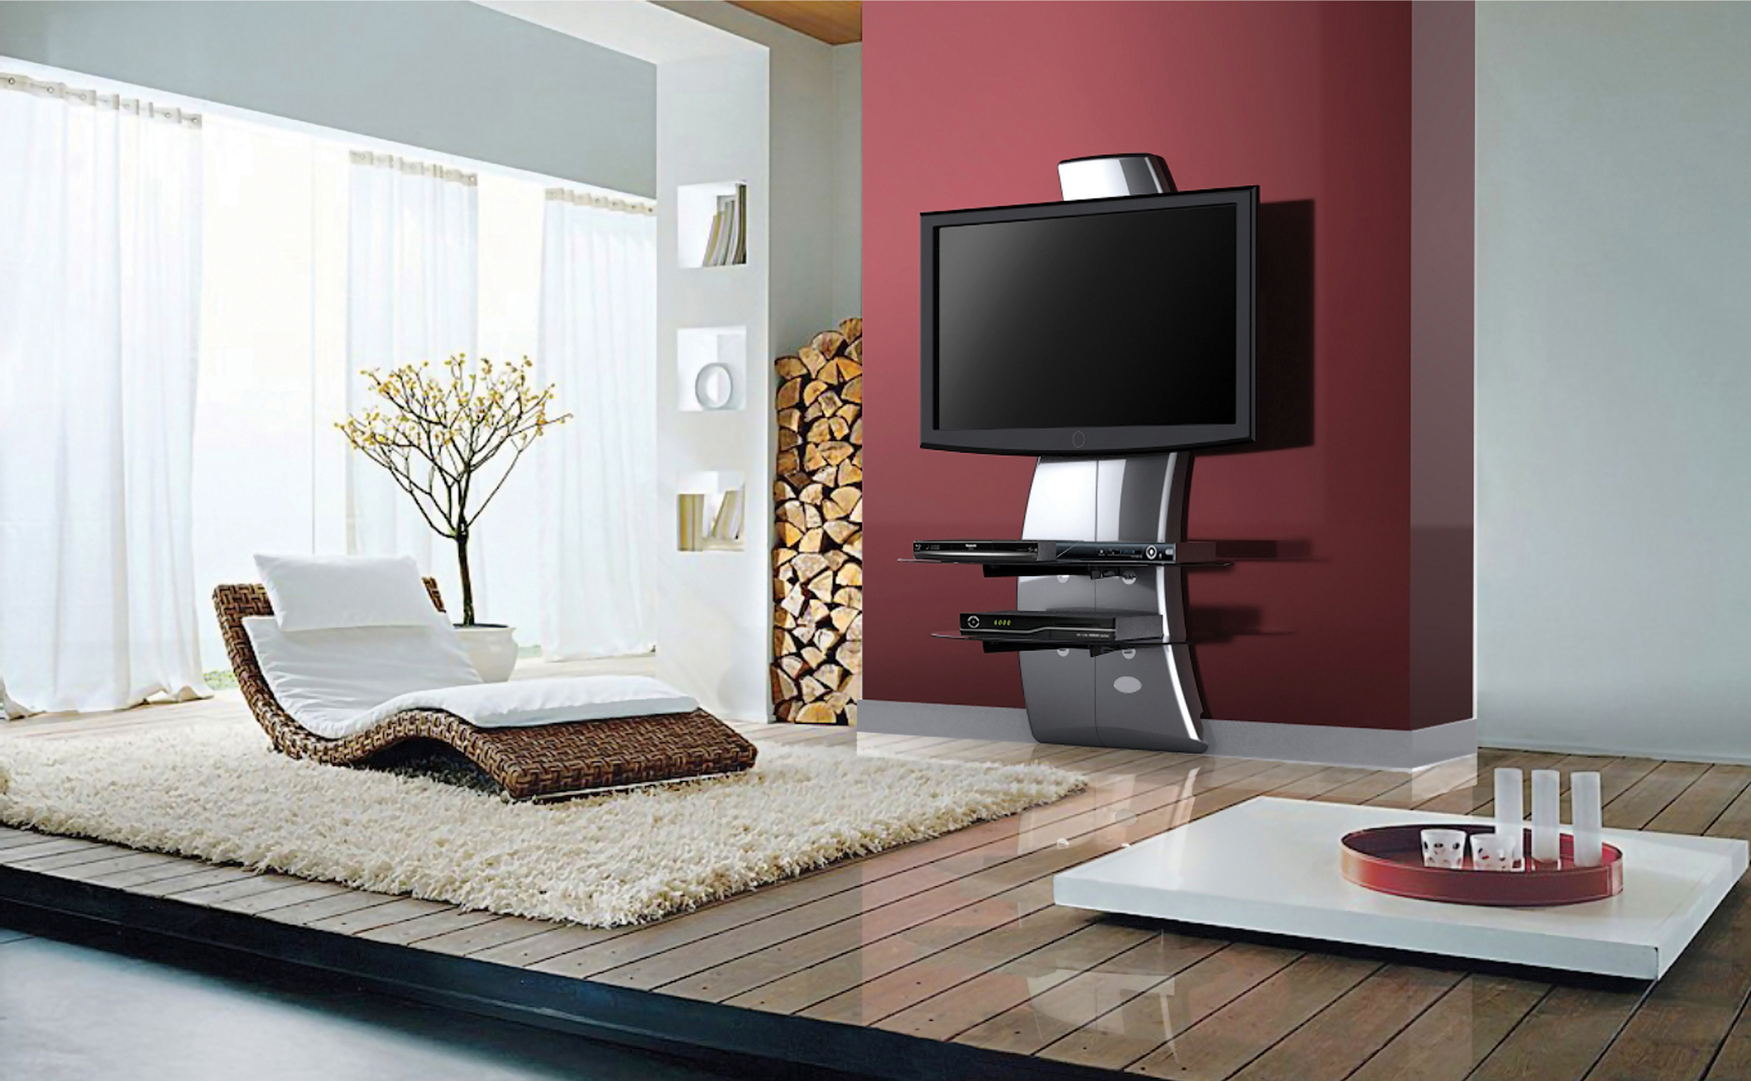 Meliconi ghost design 1000 en 2000 tv meubelen diskidee for Design 2000